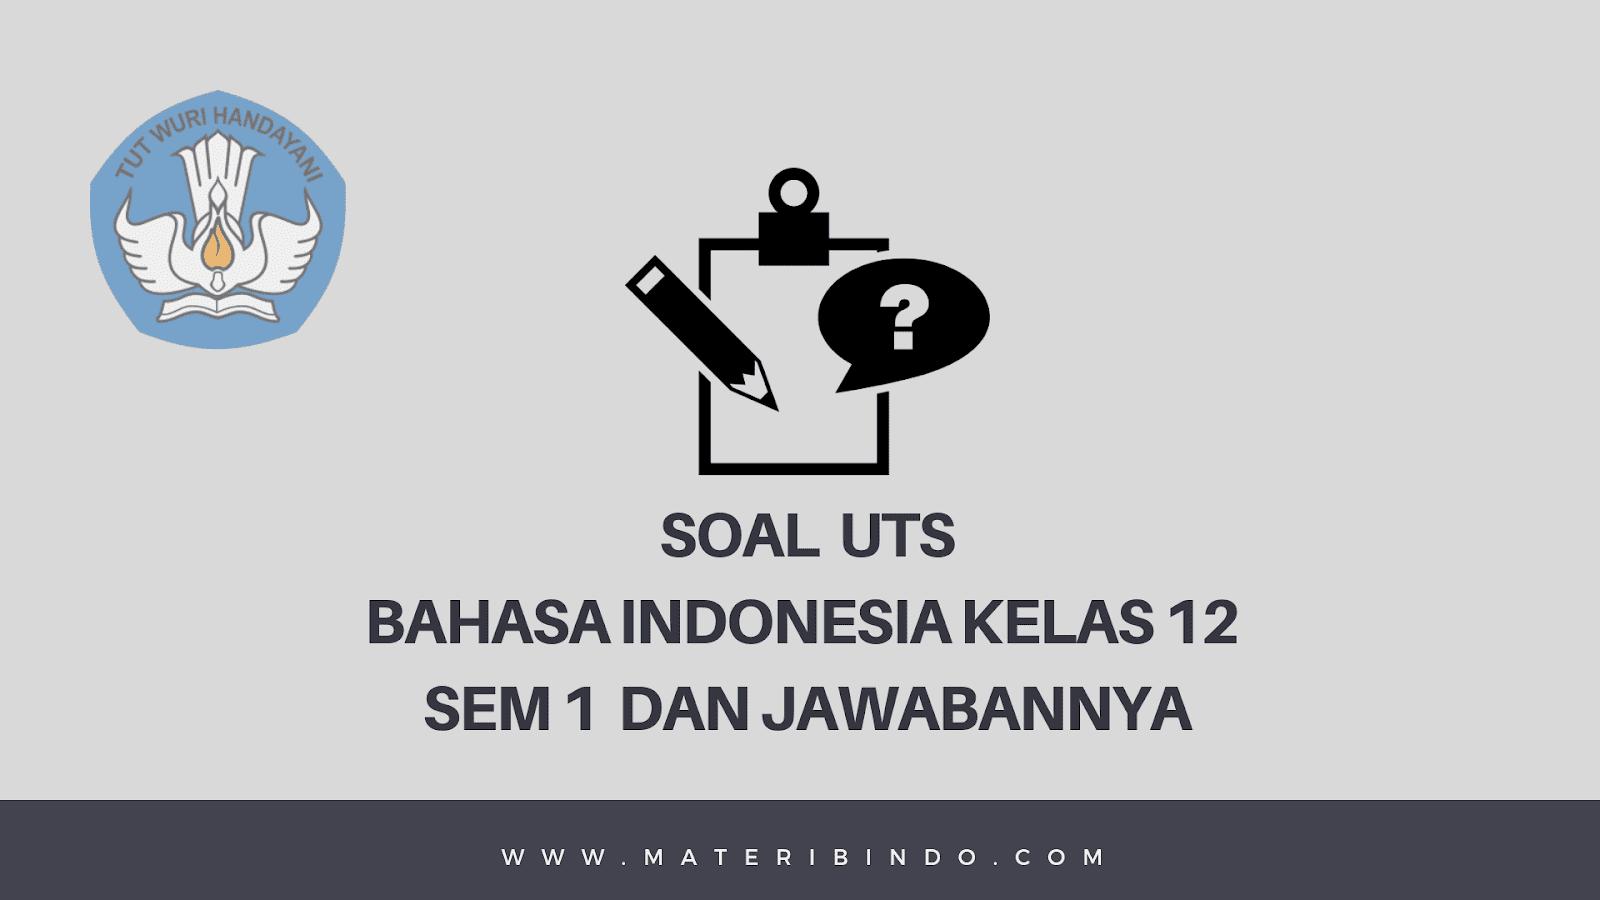 75 Contoh Soal Uts Bahasa Indonesia Kelas 12 Semester 1 Jawabannya